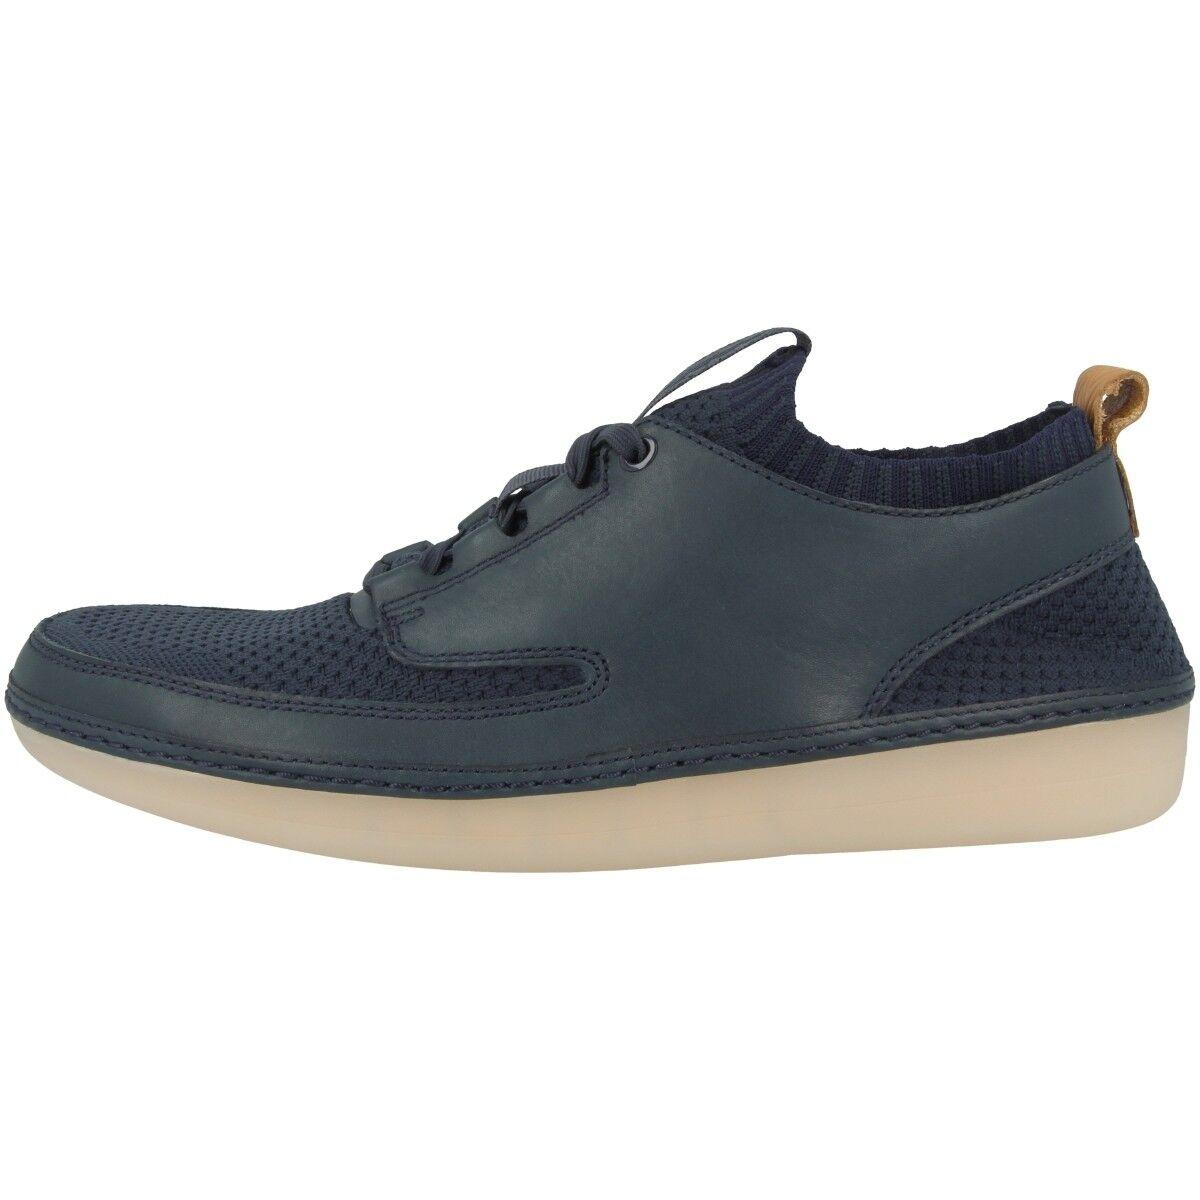 Clarks Nature IV Schuhe Herren Freizeit Leder Schnürschuhe Sneaker navy 26125773